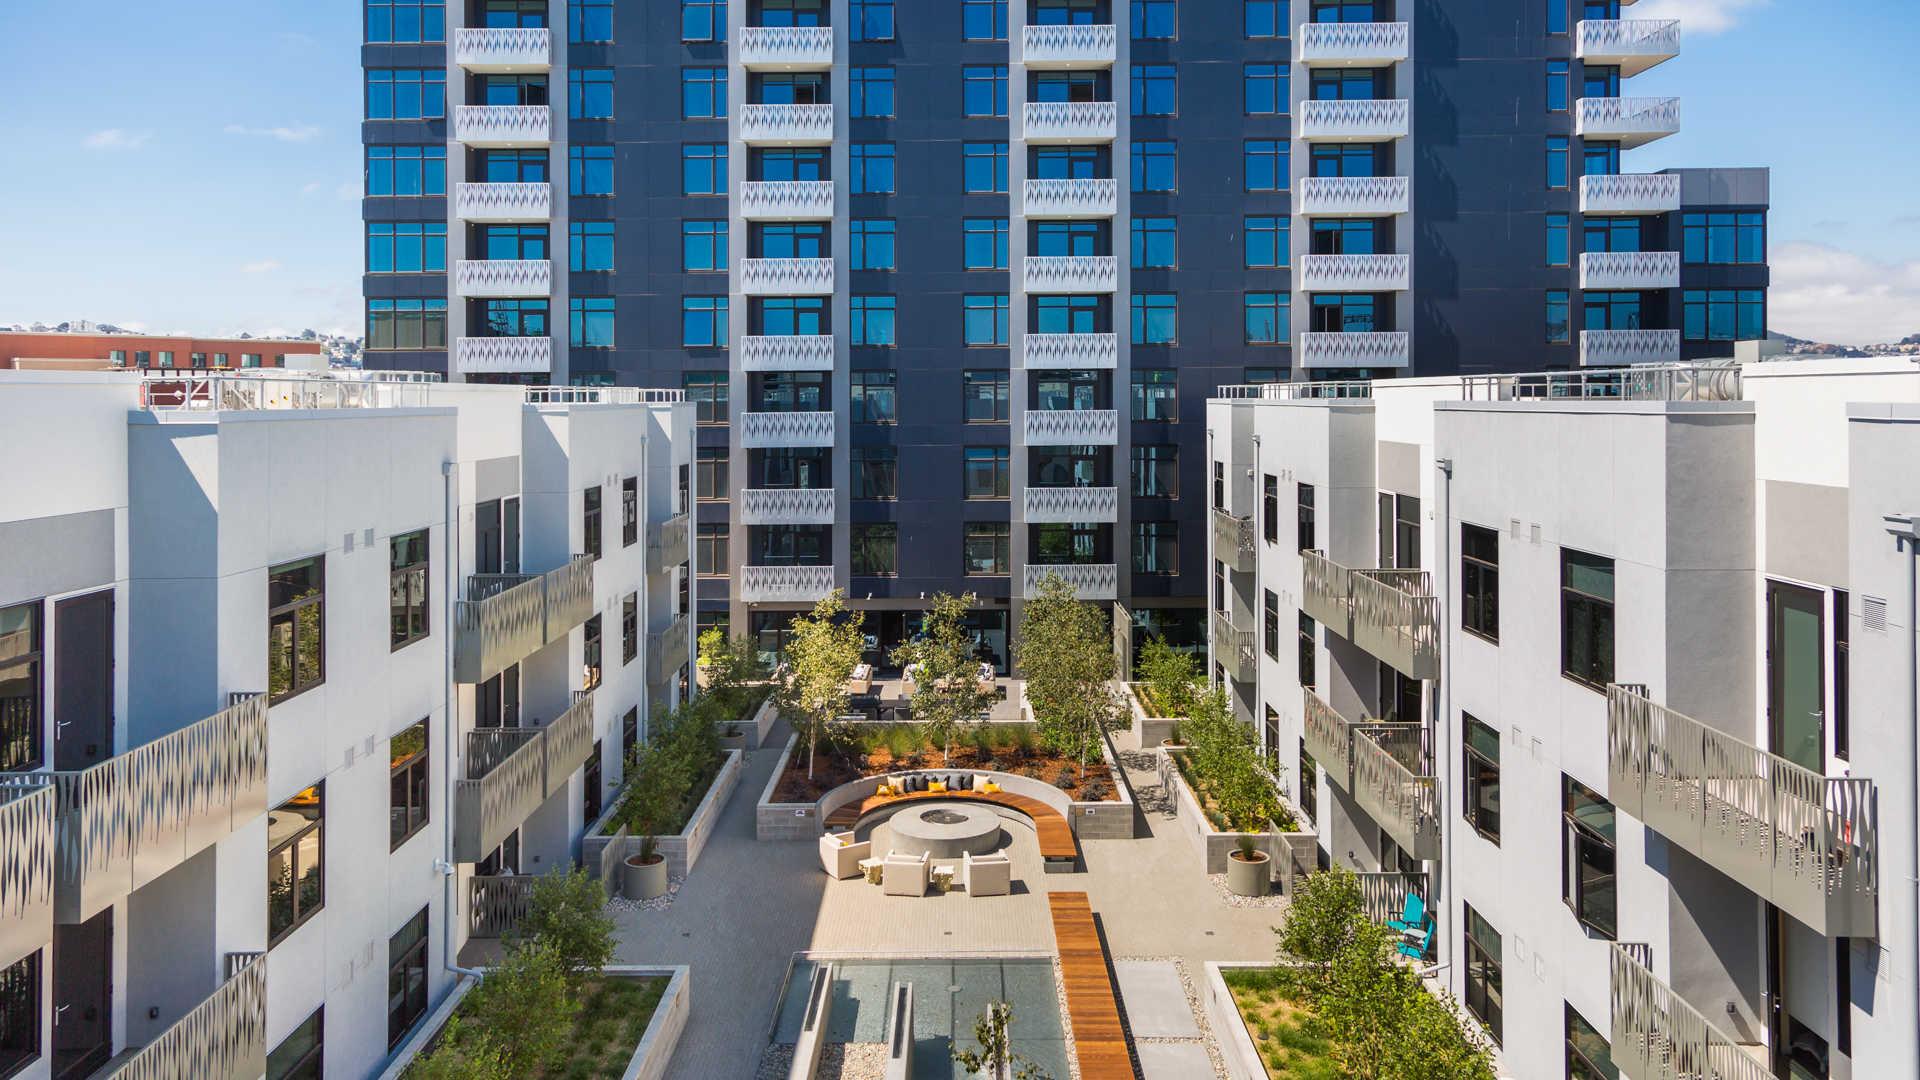 Azure Apartments Mission Bay San Francisco 690 Long Bridge